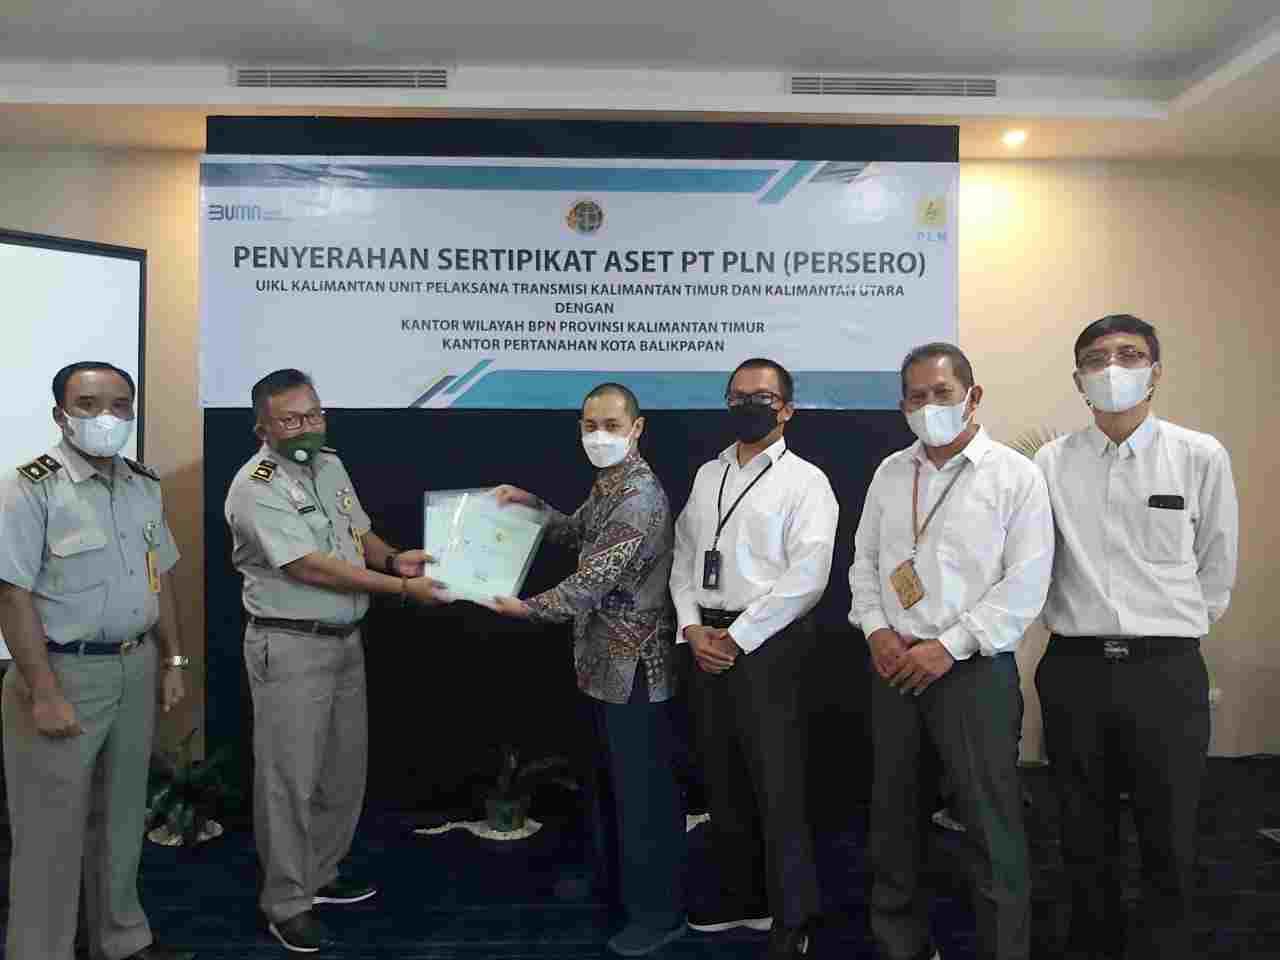 BPN Serahkan Sertifikat Aset ke PLN UPT Kaltimra